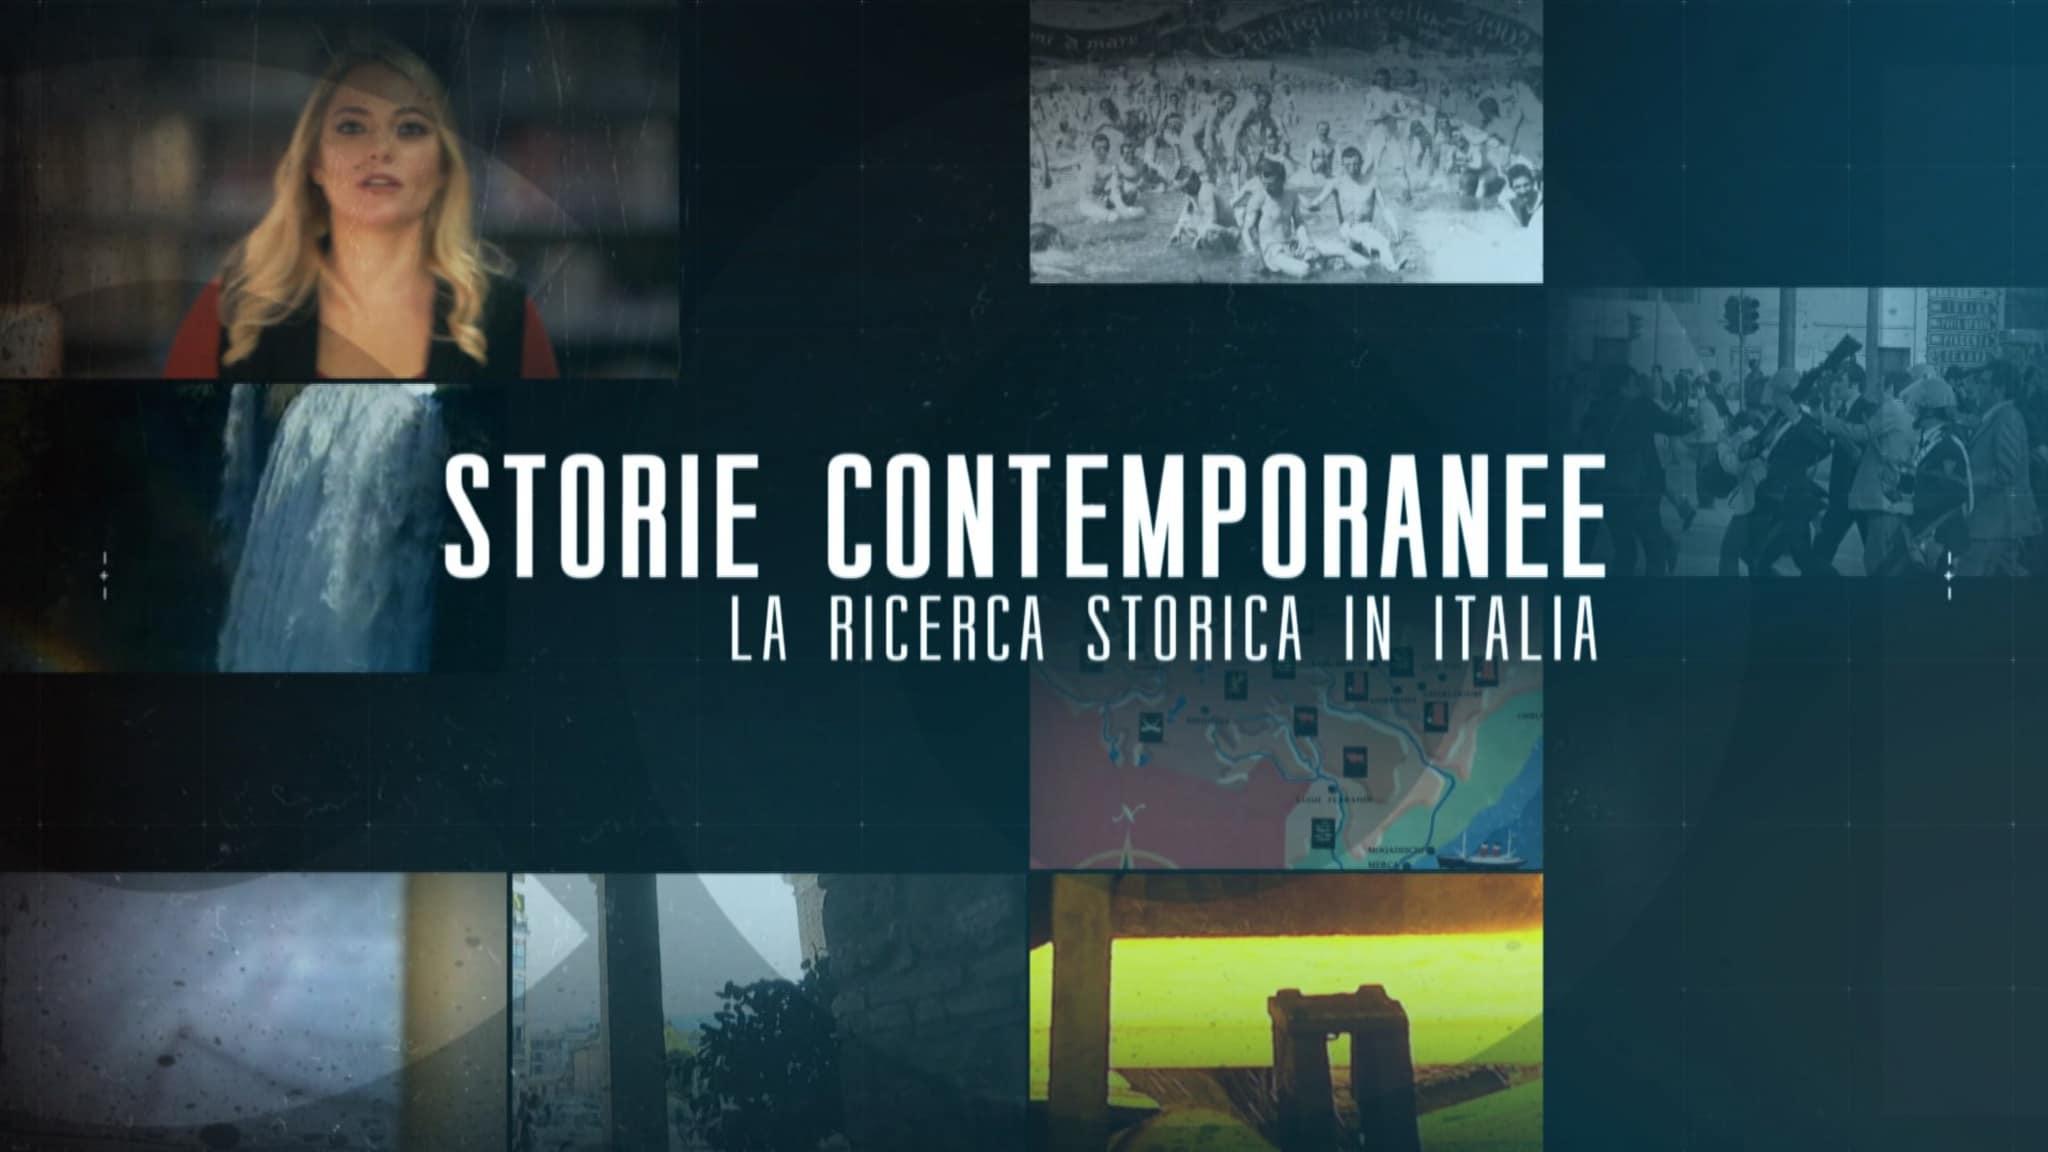 Rai Storia Storie contemporanee. La ricerca storica in Italia p.2